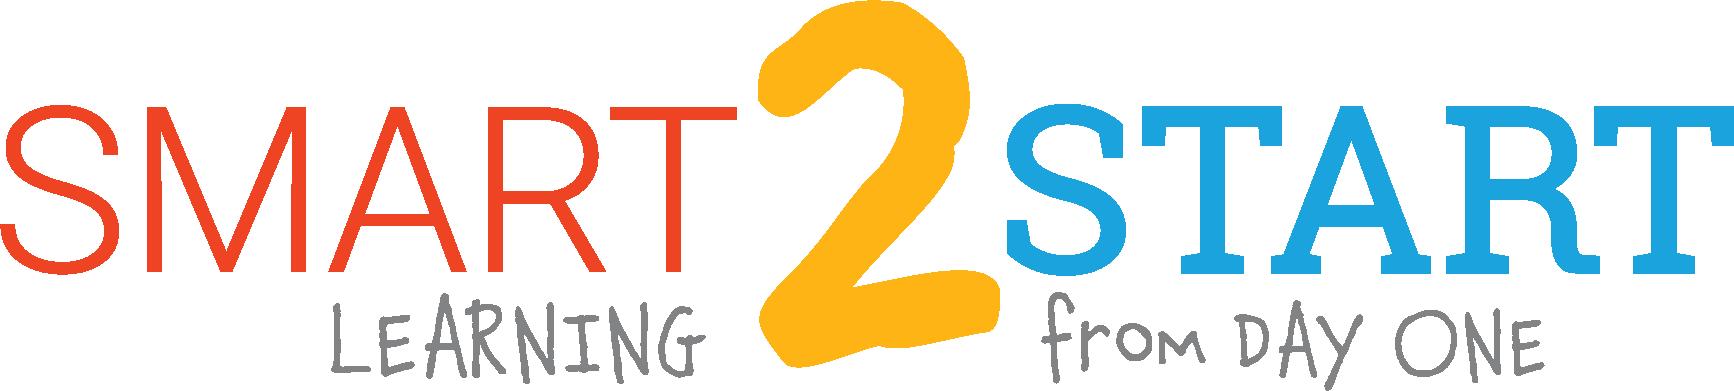 Smart2Start_Logo_Tag_4C.png